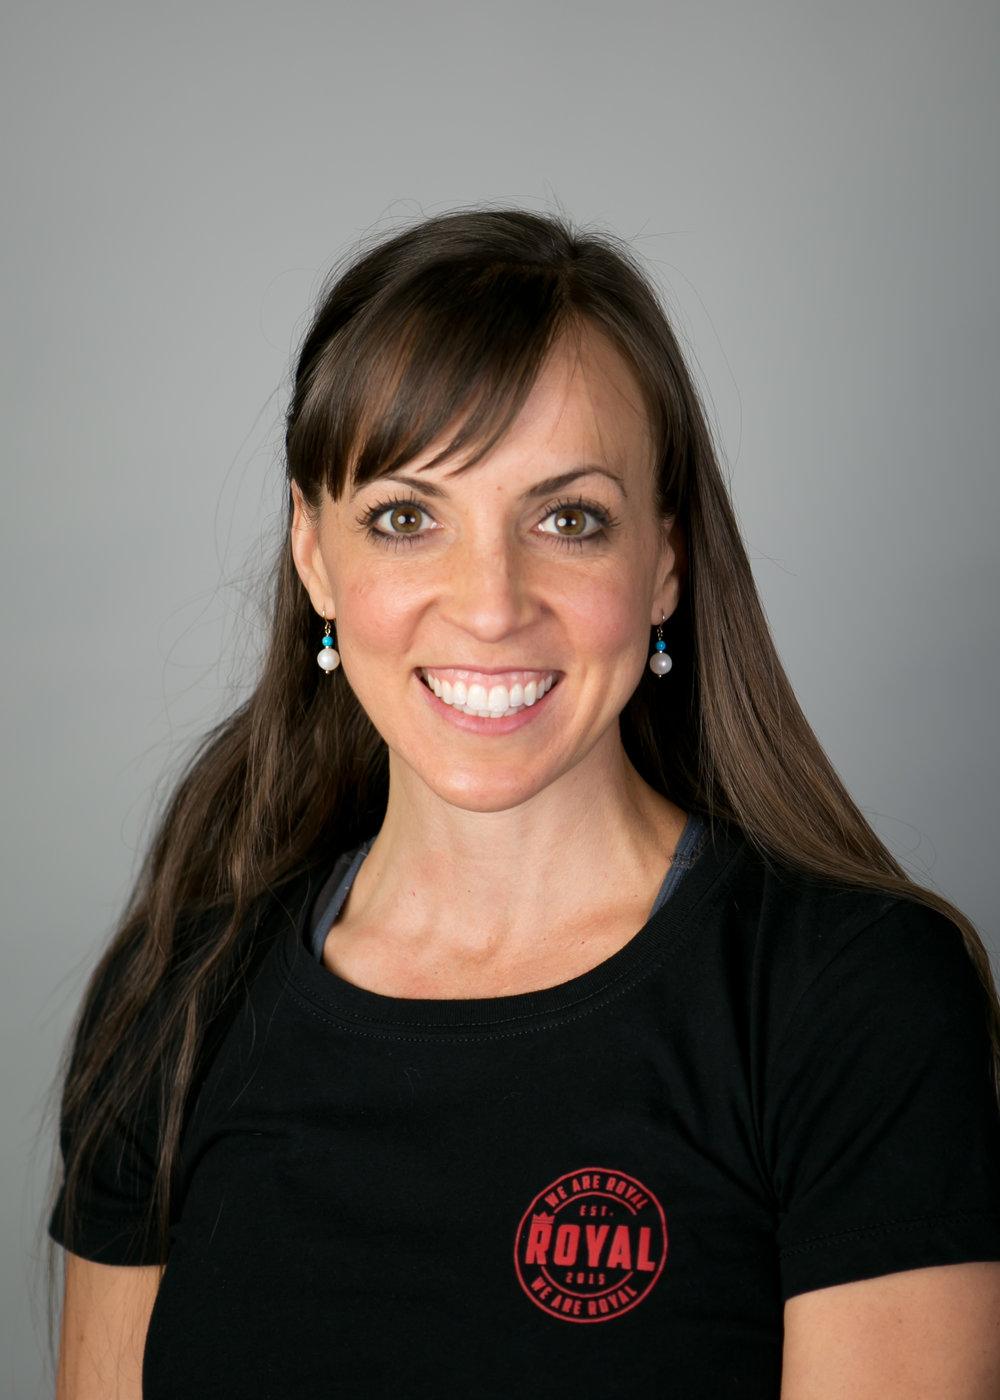 Coach Camille Preschool Director